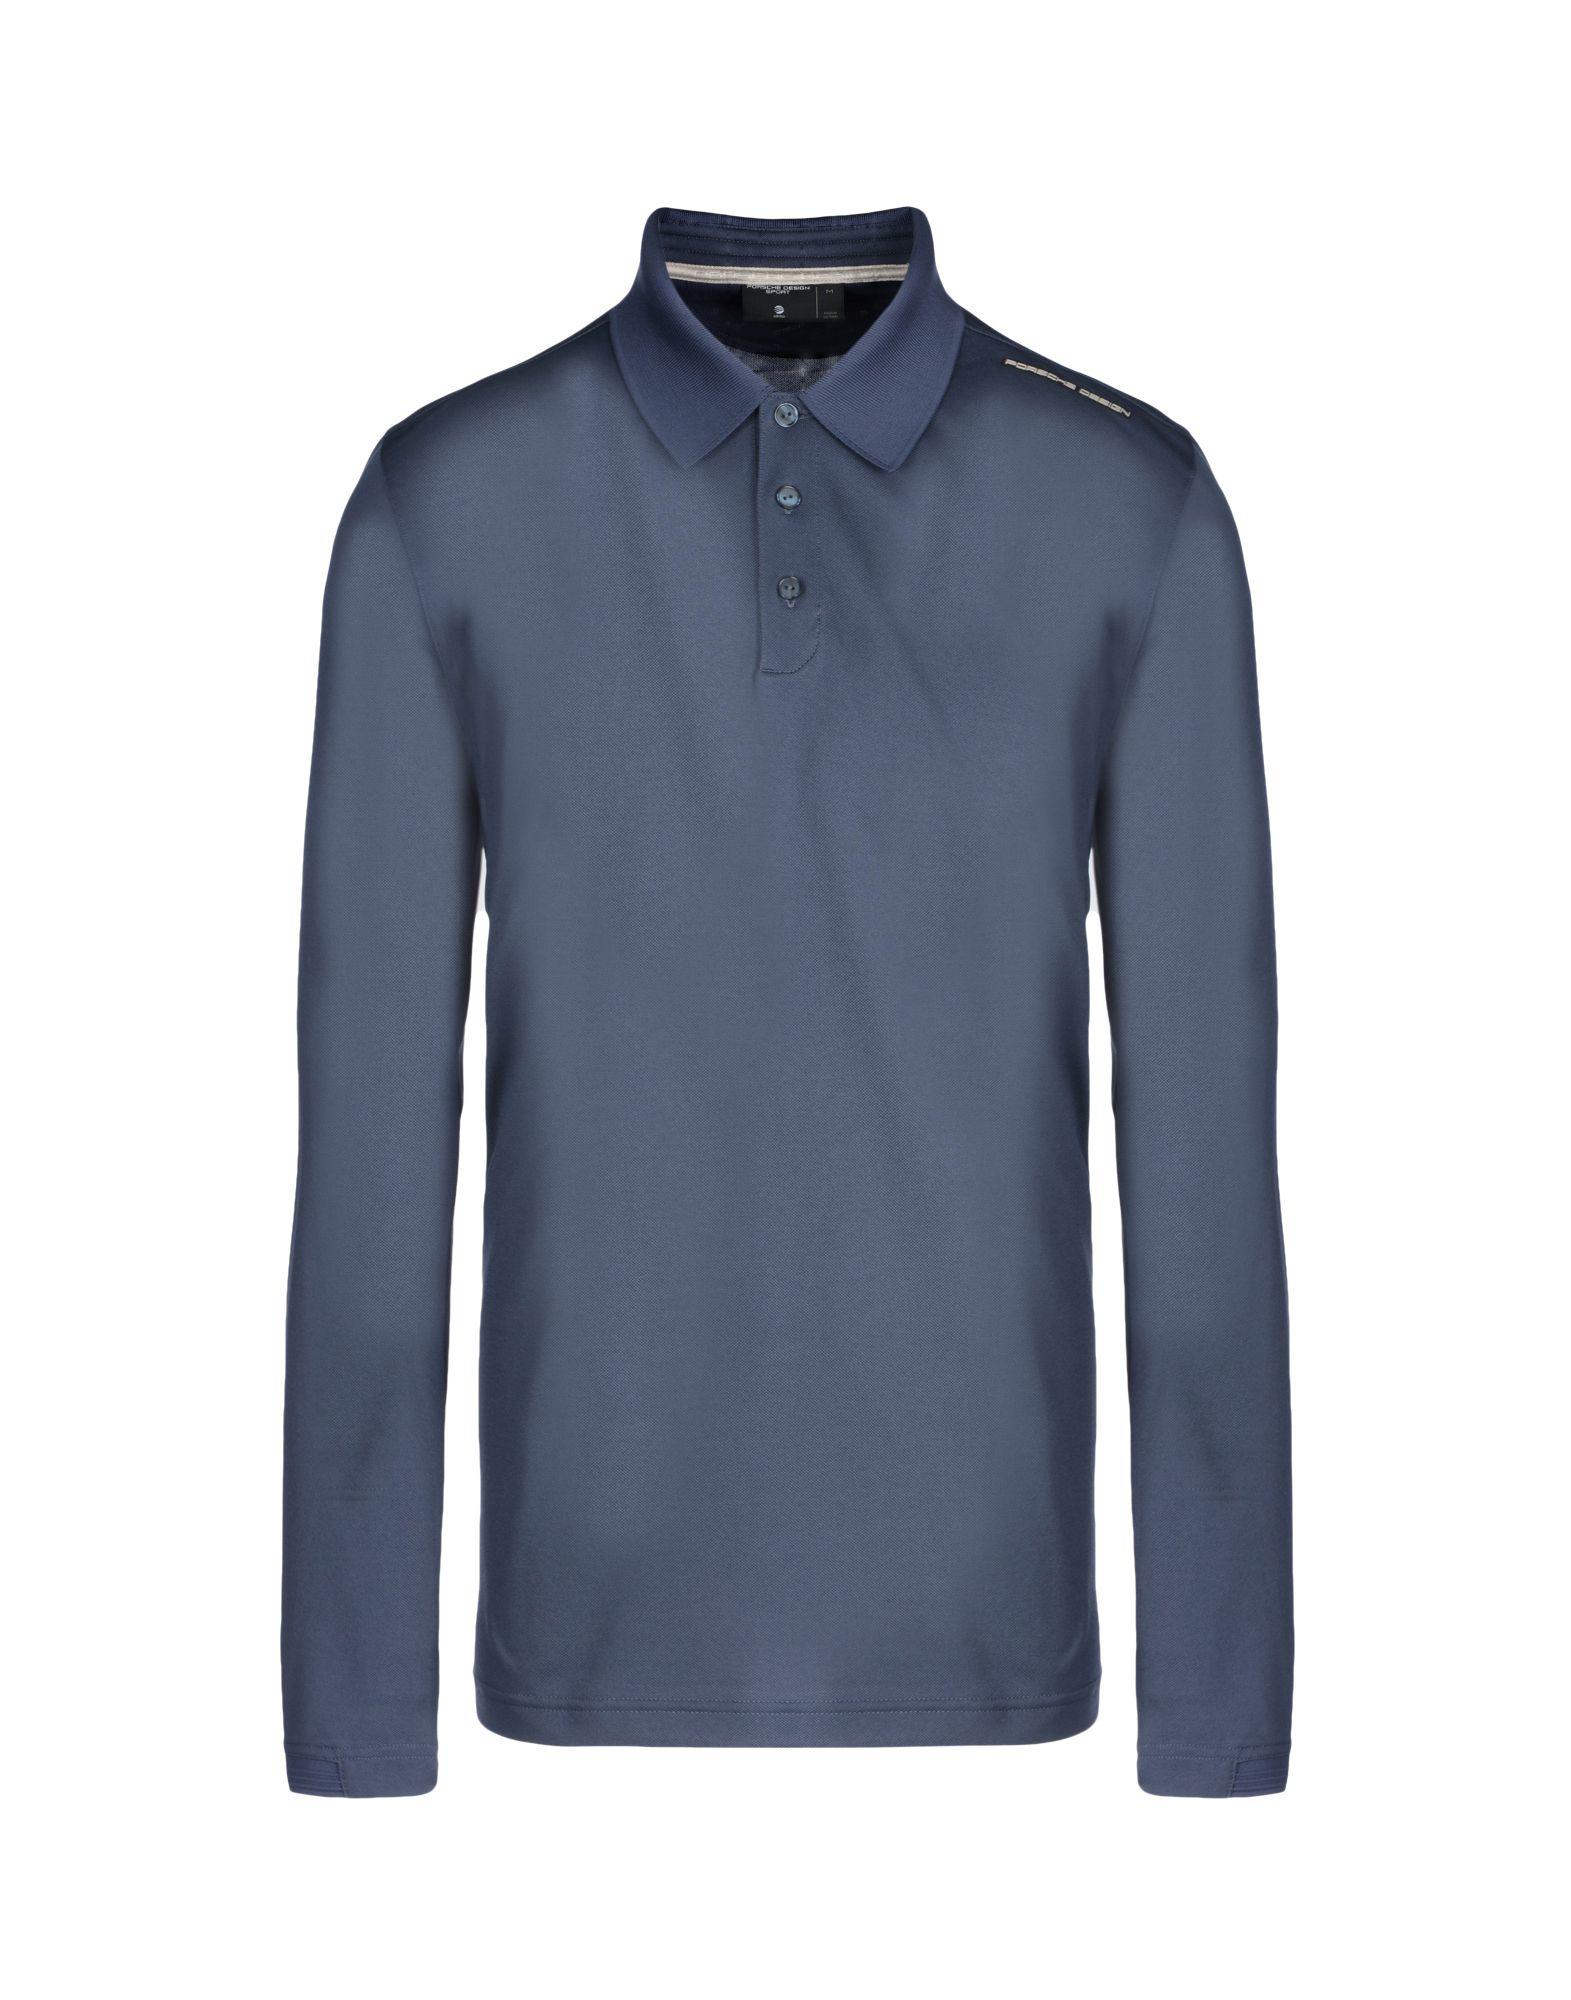 Porsche Design Polo Shirt In Blue For Men Lyst